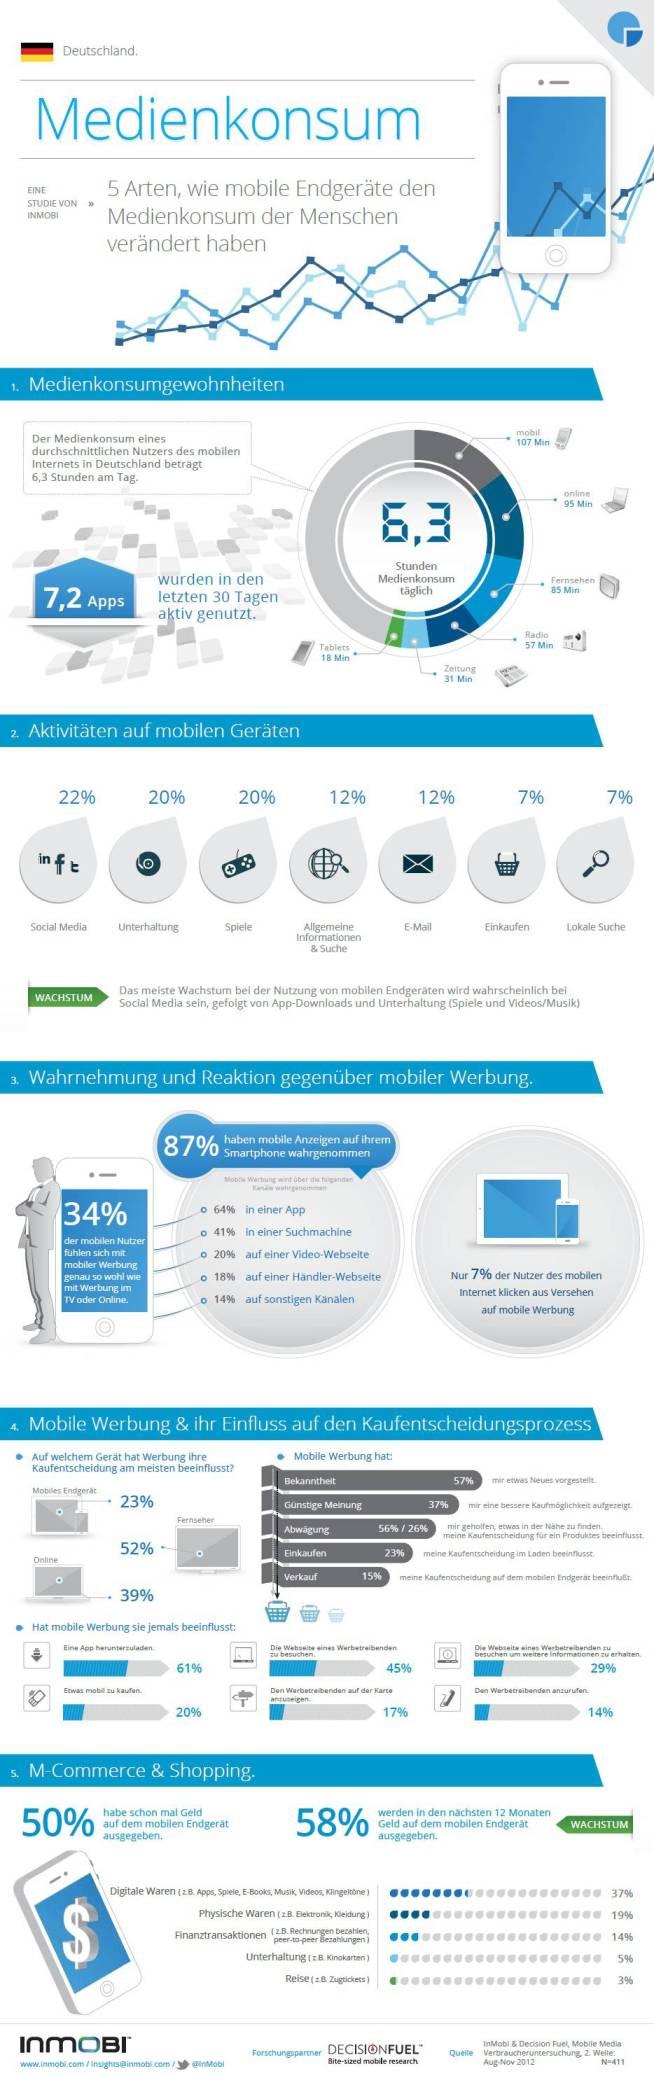 InMobi Infografik Mobile Media Consumption Wave 2 - Deutschland